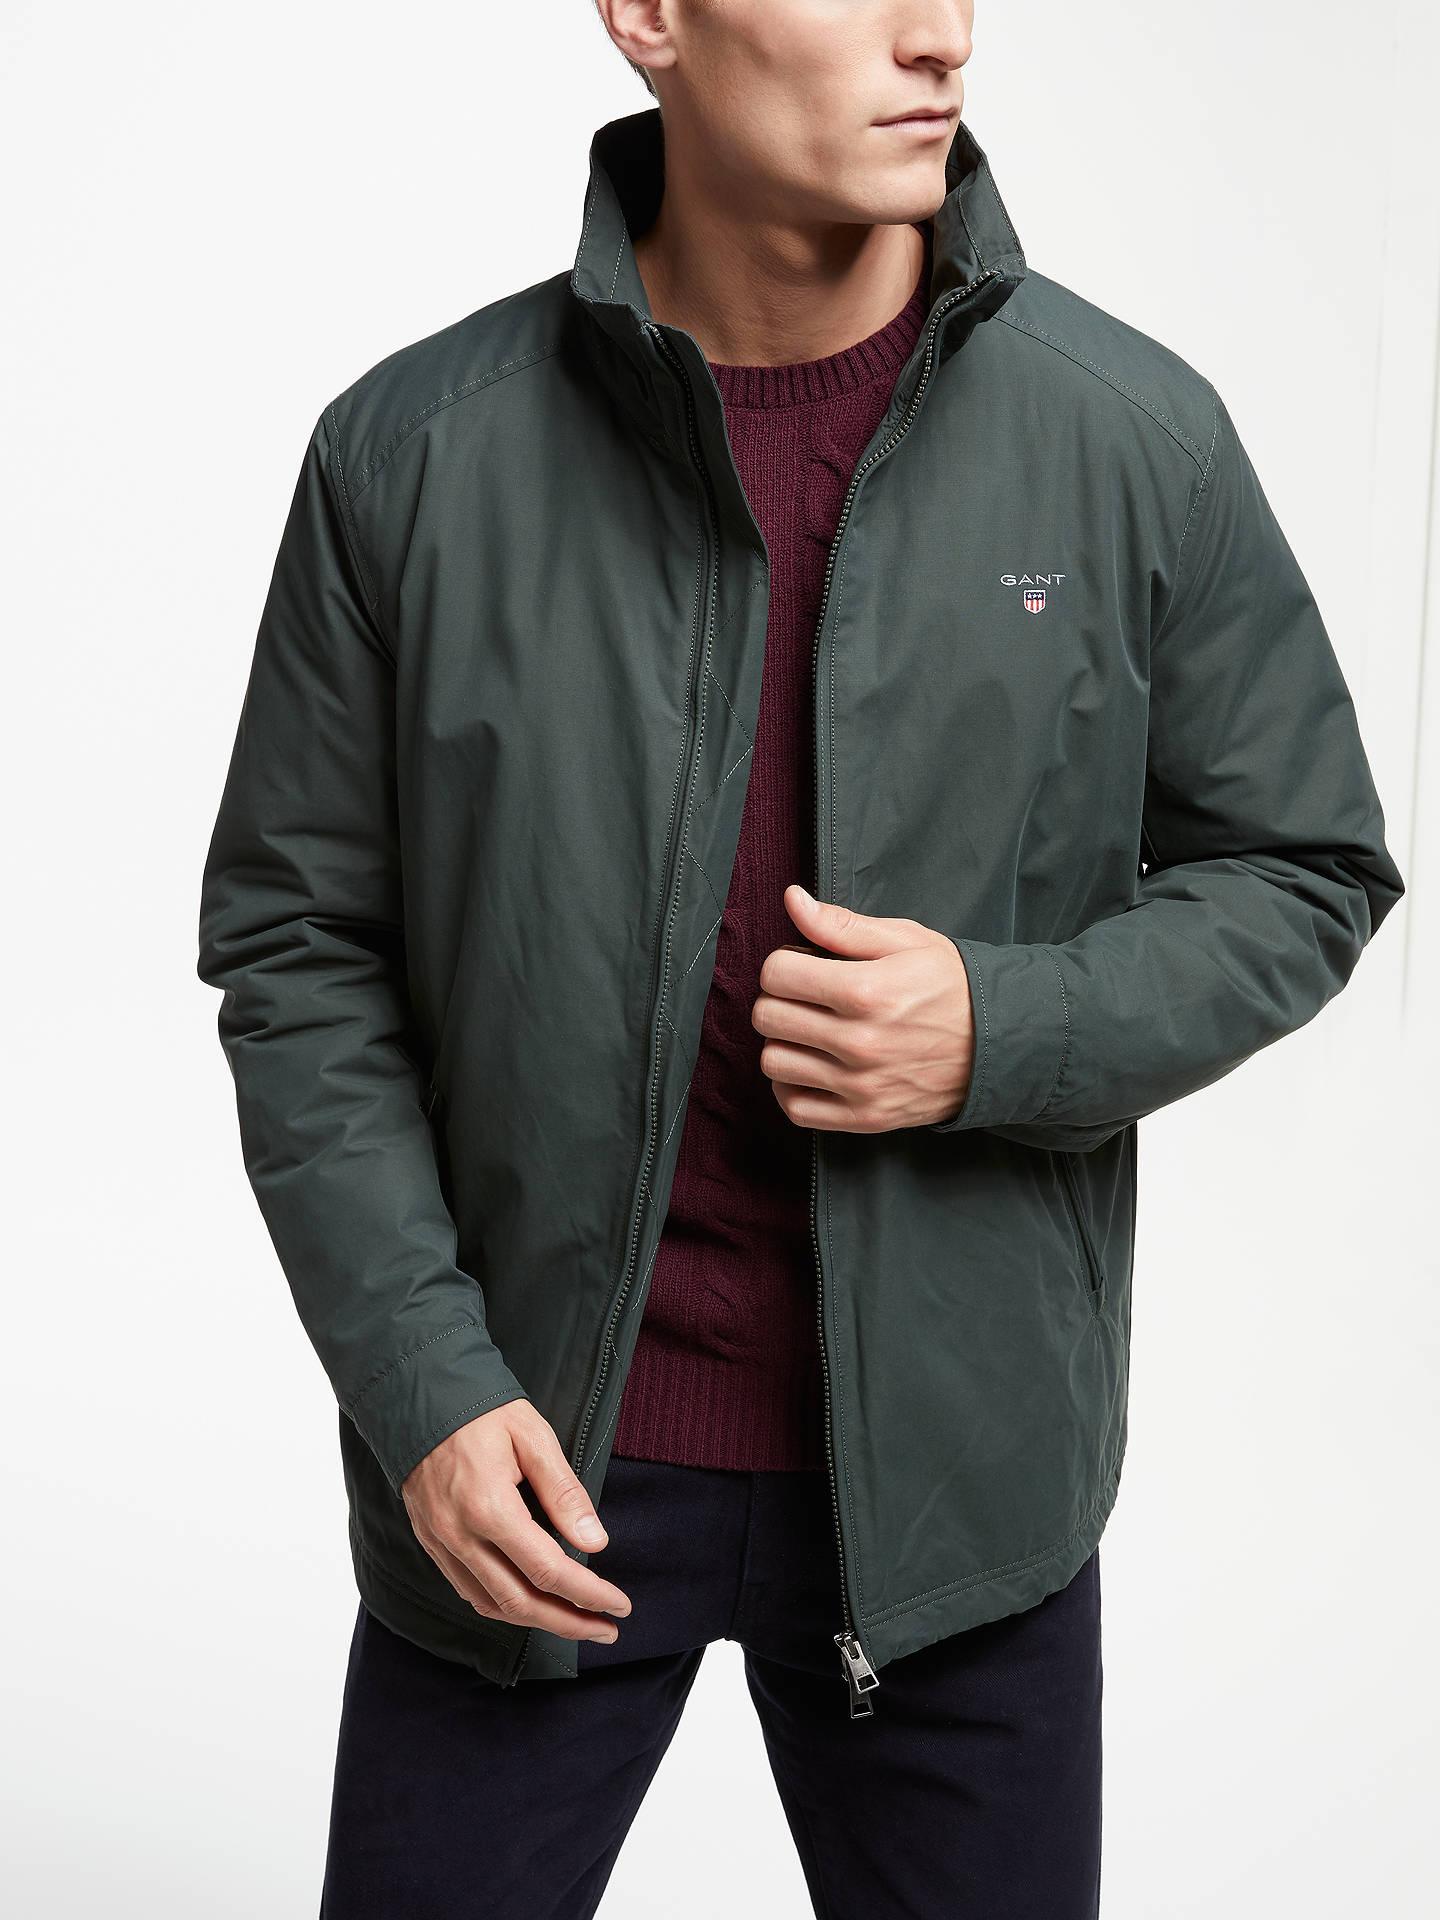 Gant At Mid John Partners Jacket Green amp; Lewis Length rxgprOIqw